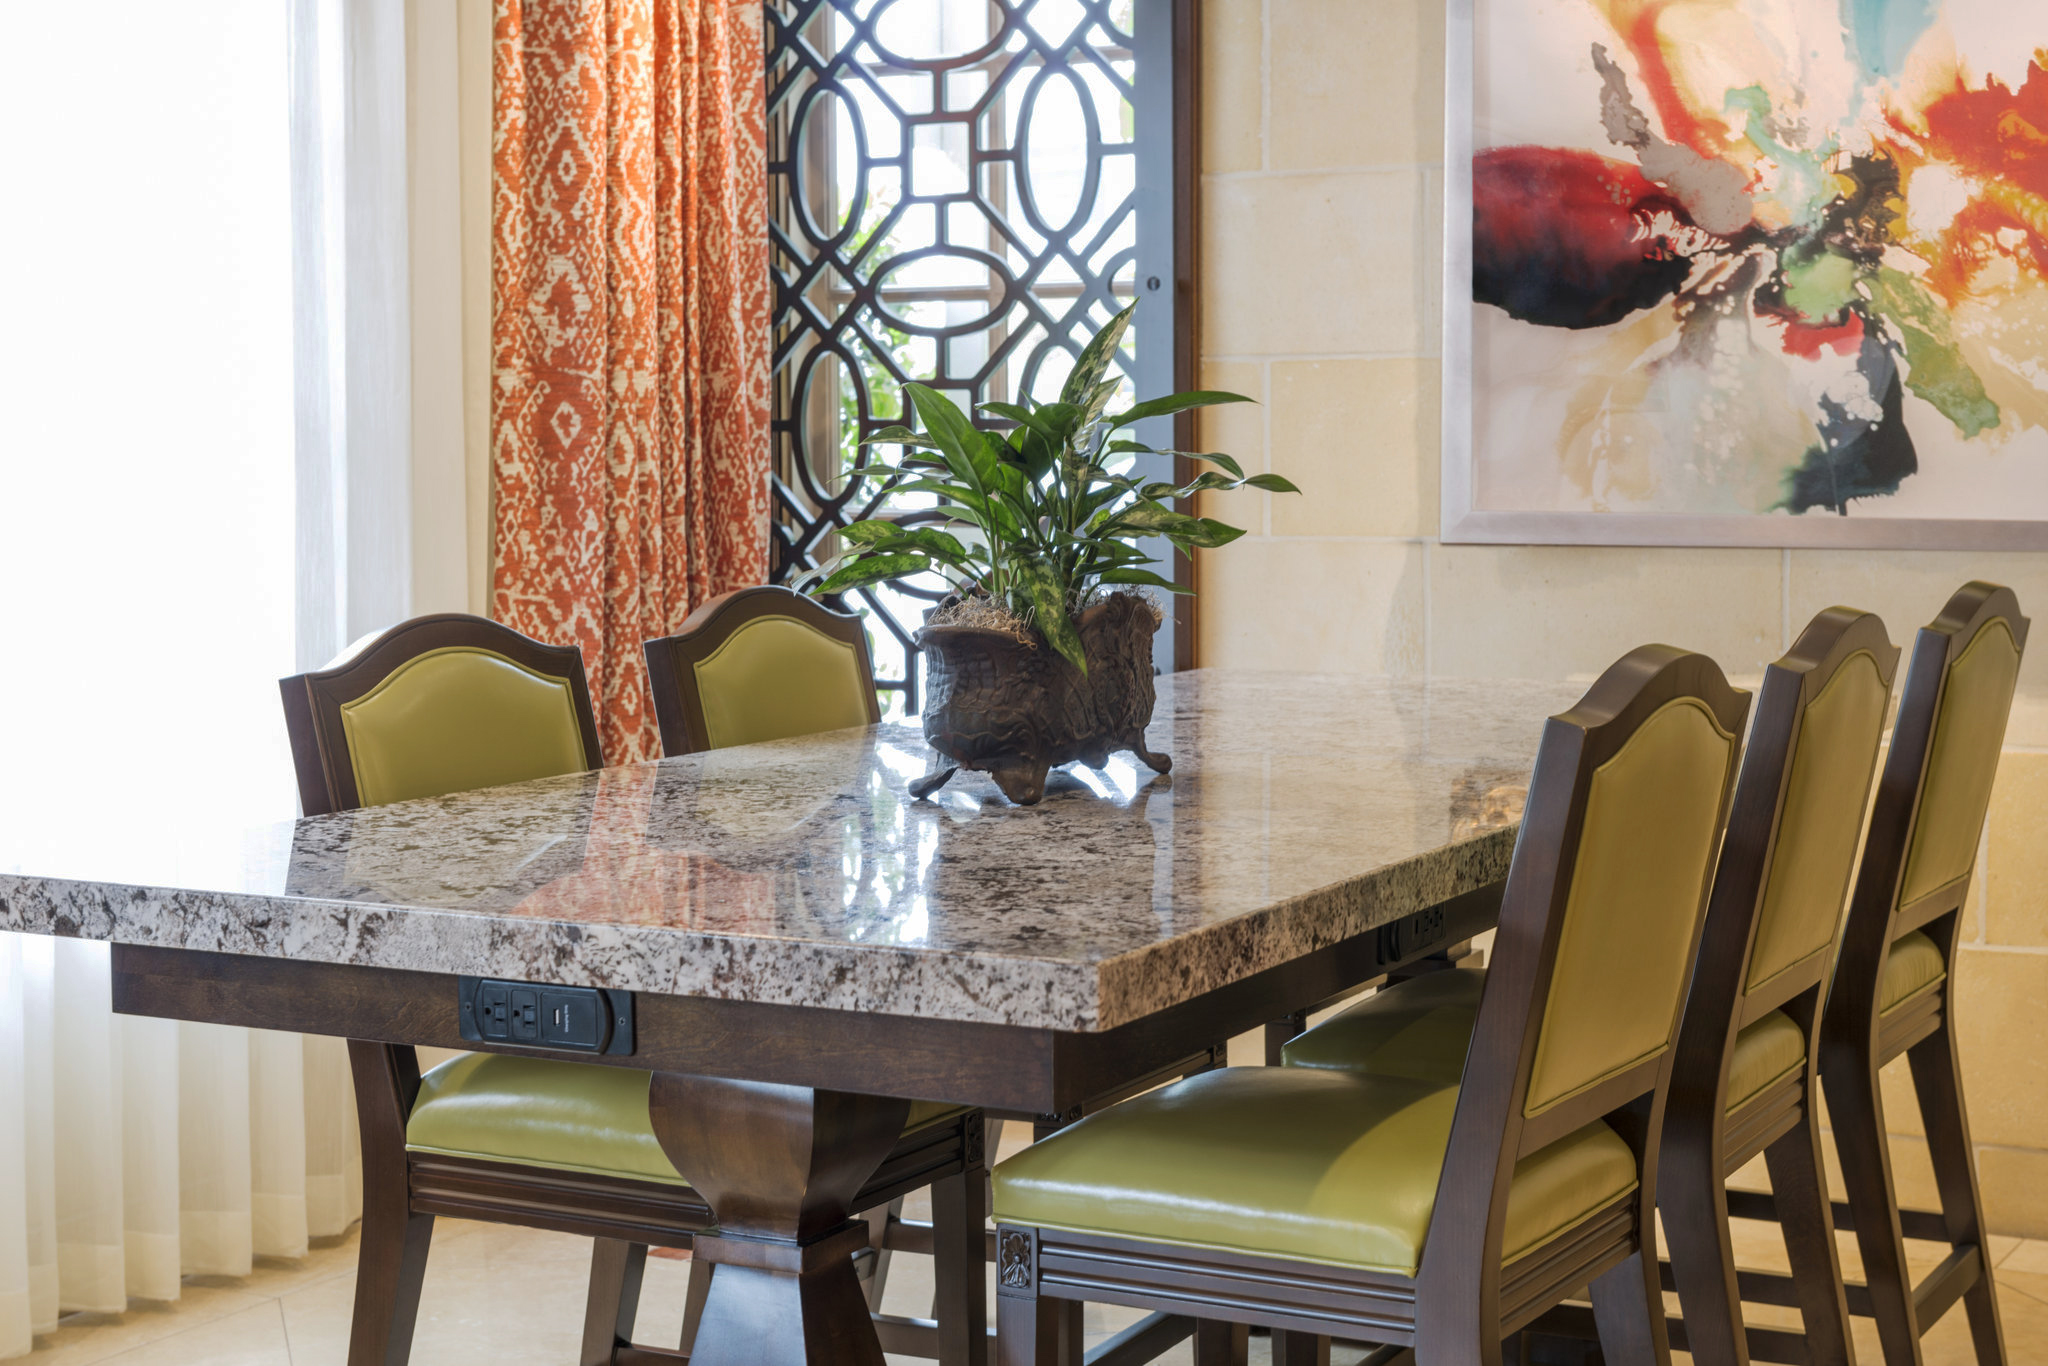 Ayres Hotel, Anaheim, CA   Custom pattern, window accent